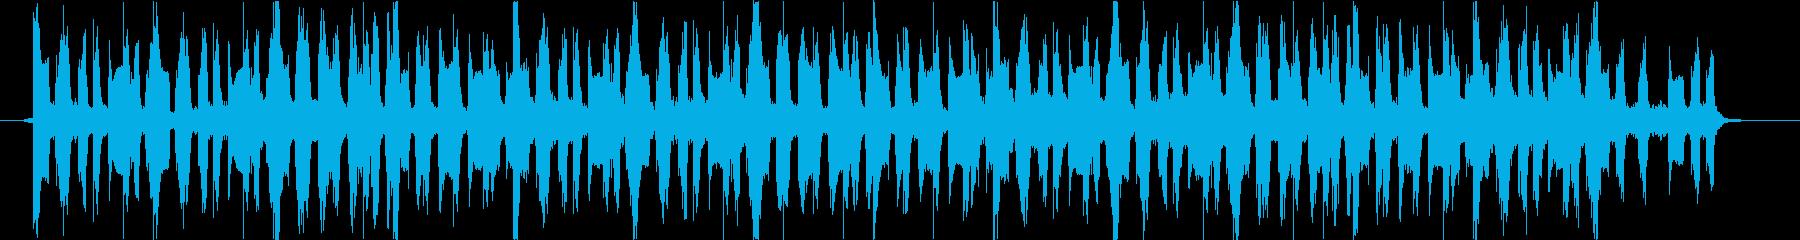 CM用エレキギターでノリの良い都会的曲の再生済みの波形